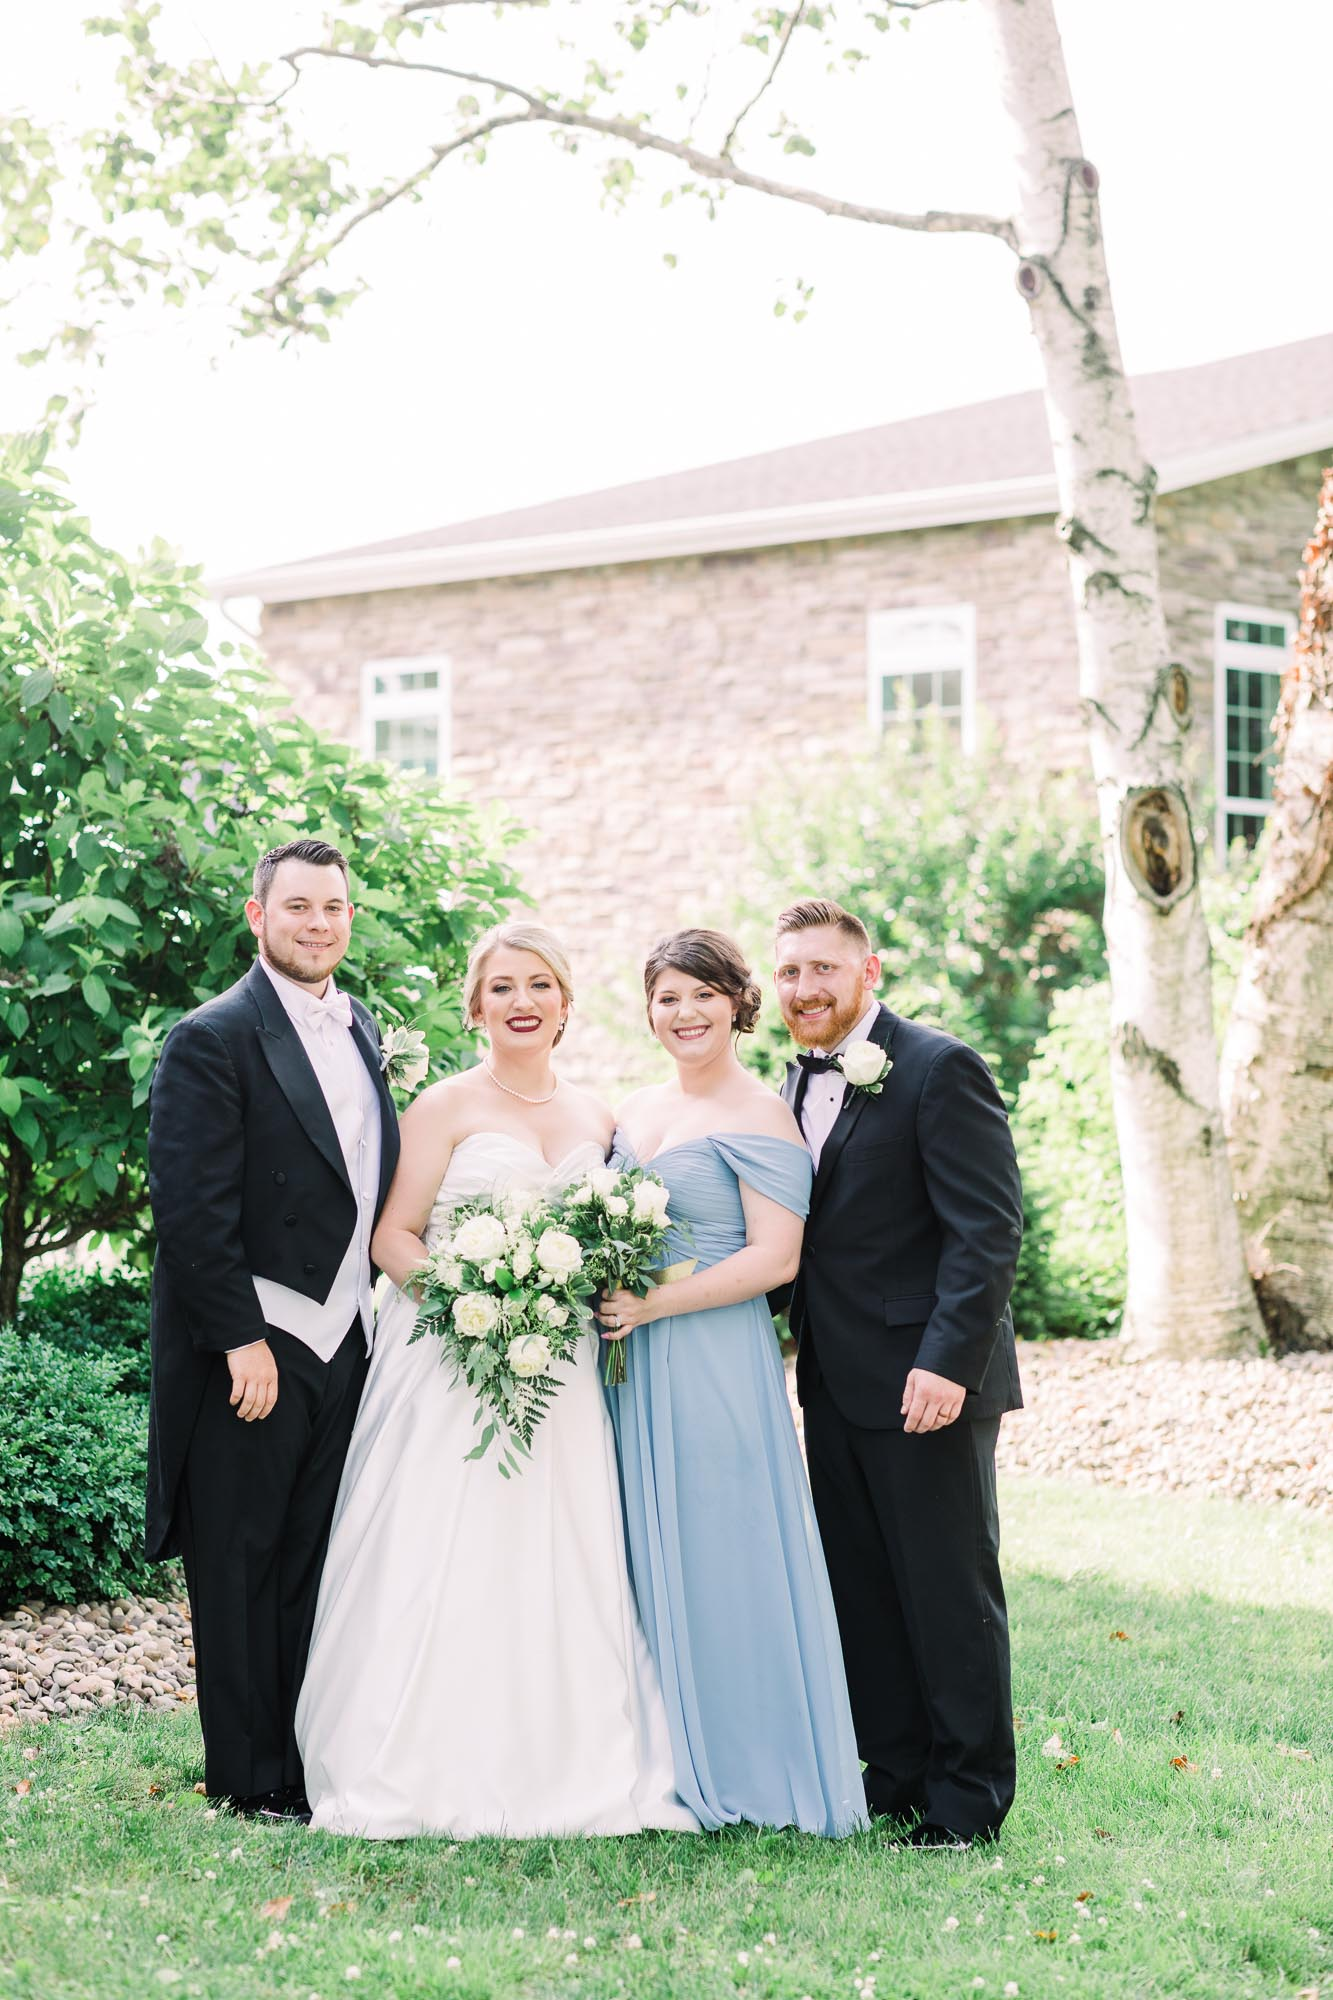 isle-of-que-wedding-4011.jpg